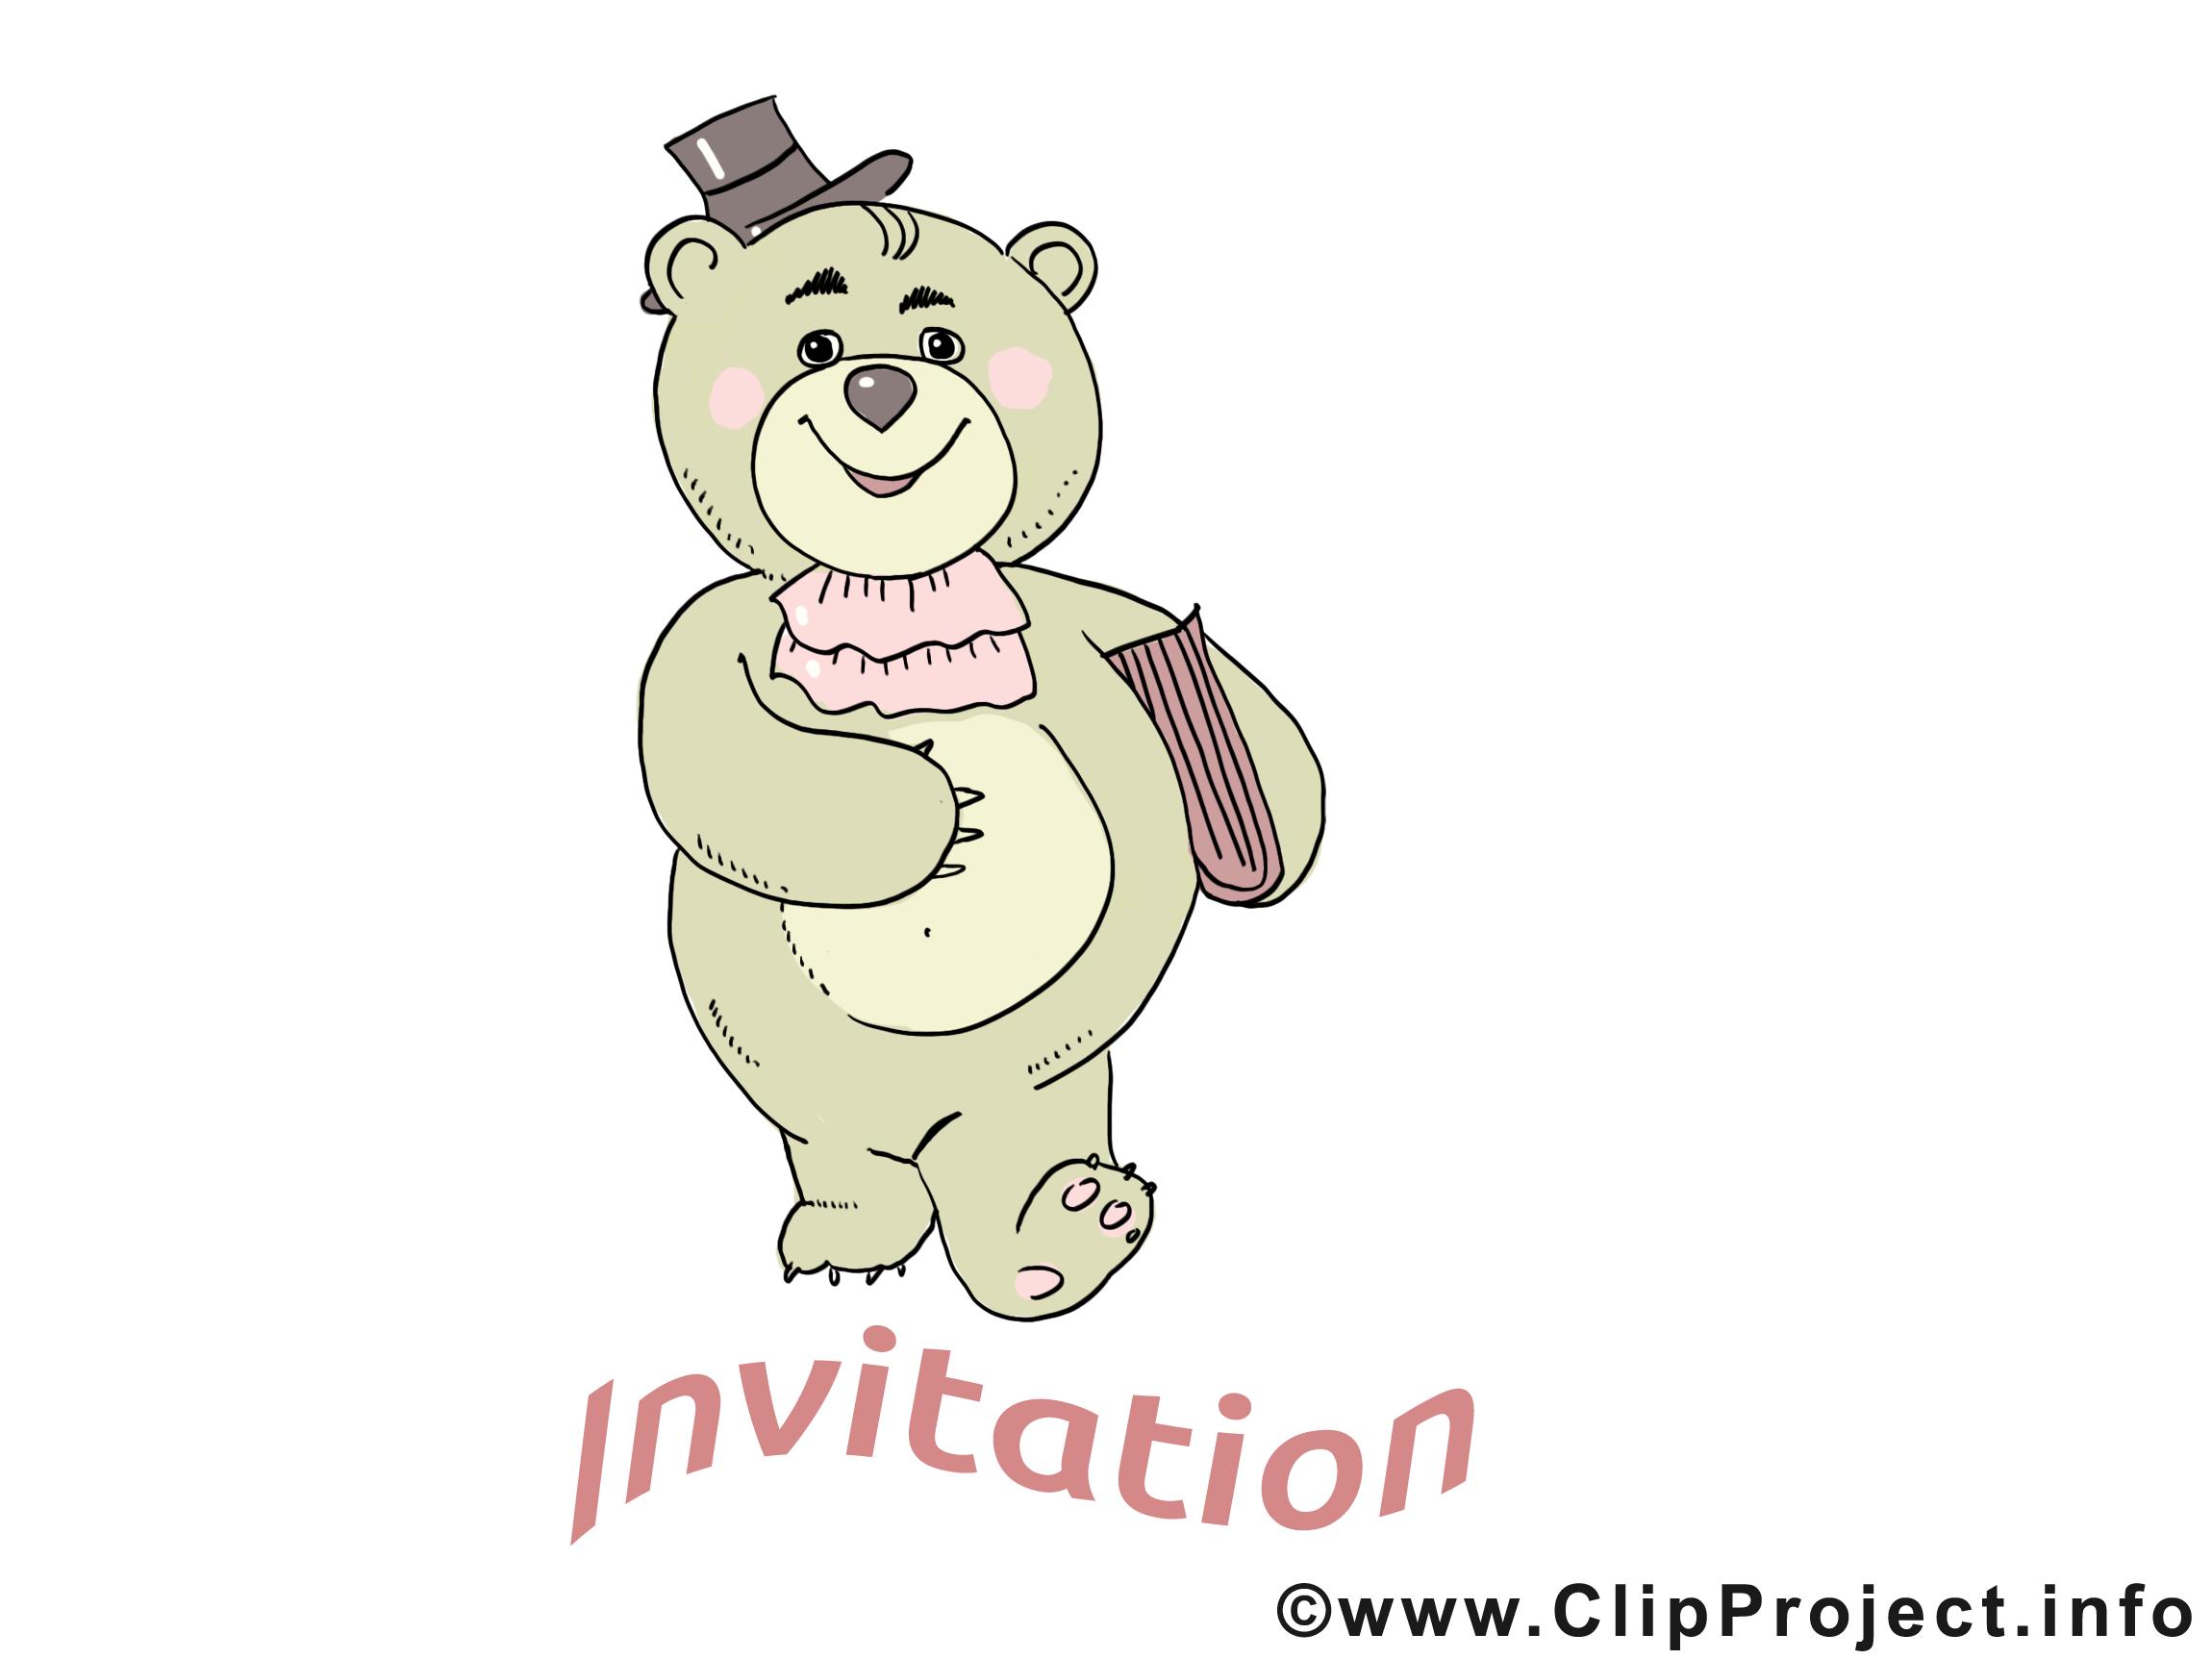 Ours clipart - Invitation dessins gratuits